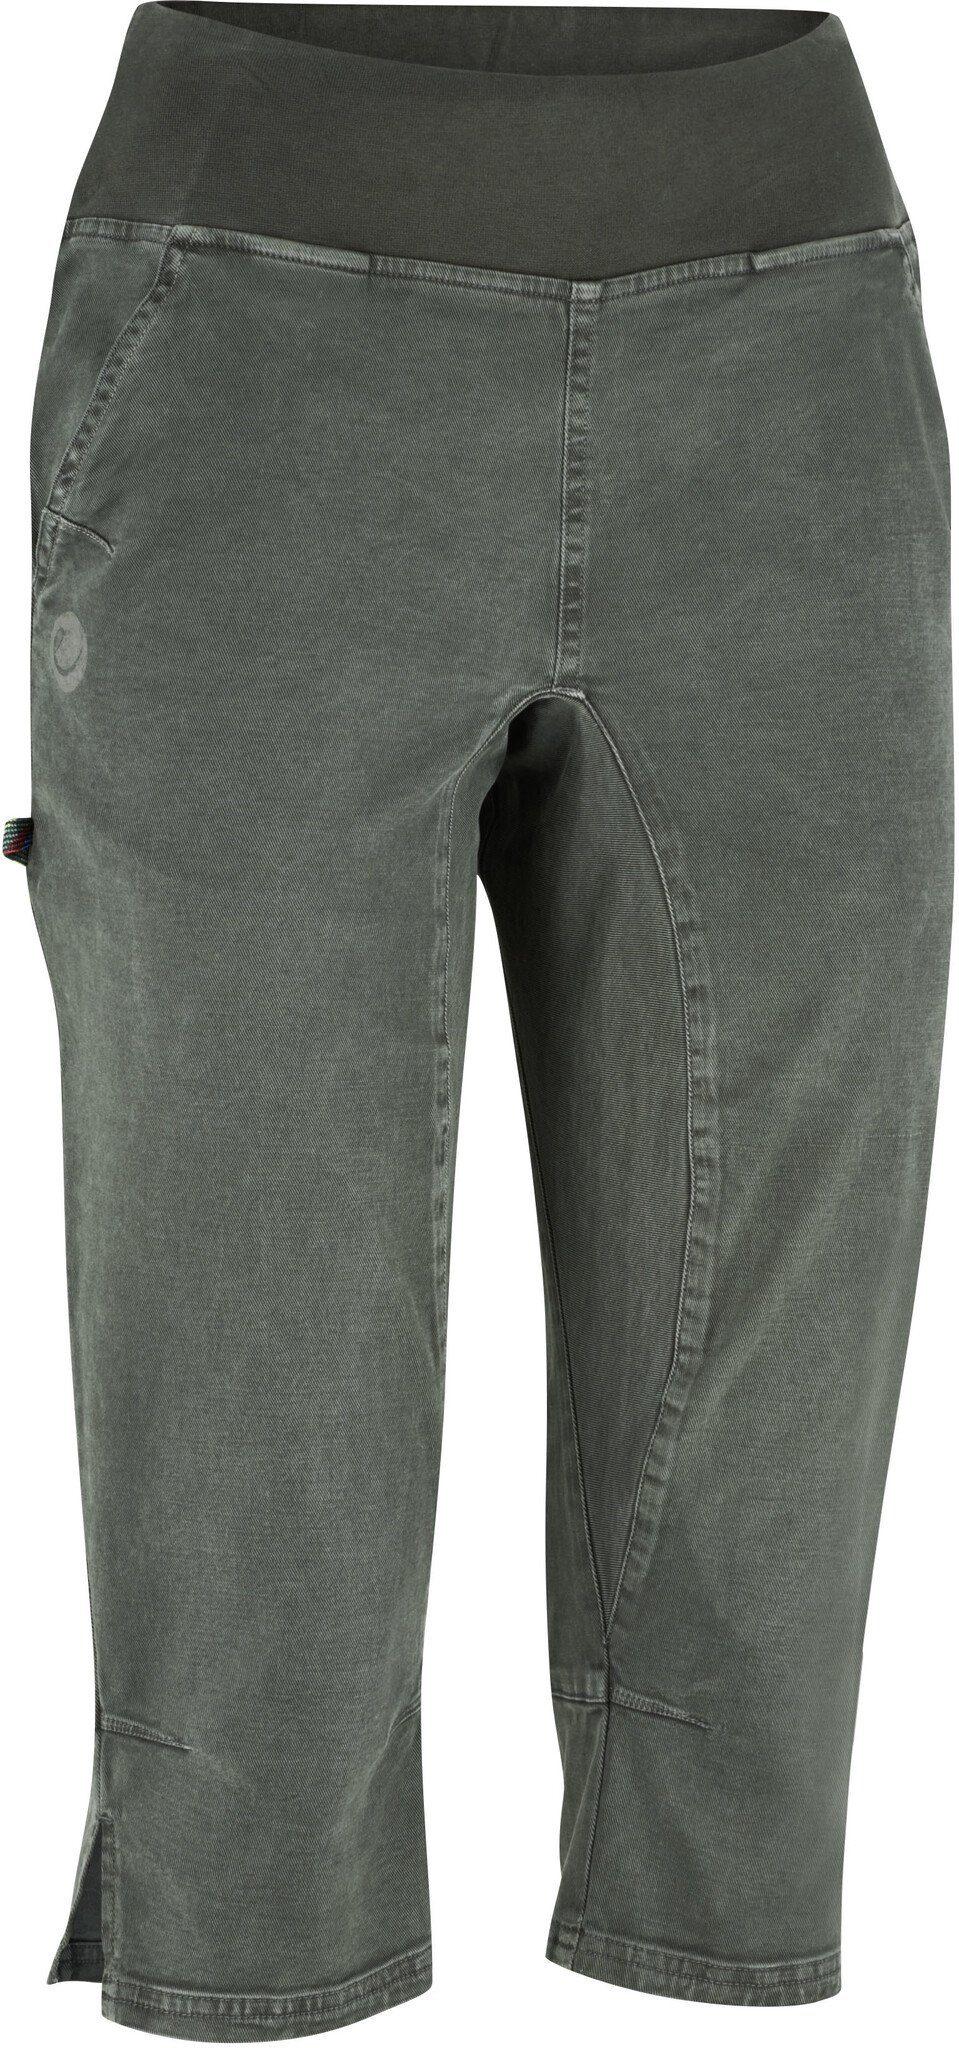 Bermuda Jeans Uomo Nero Lee Rider Black